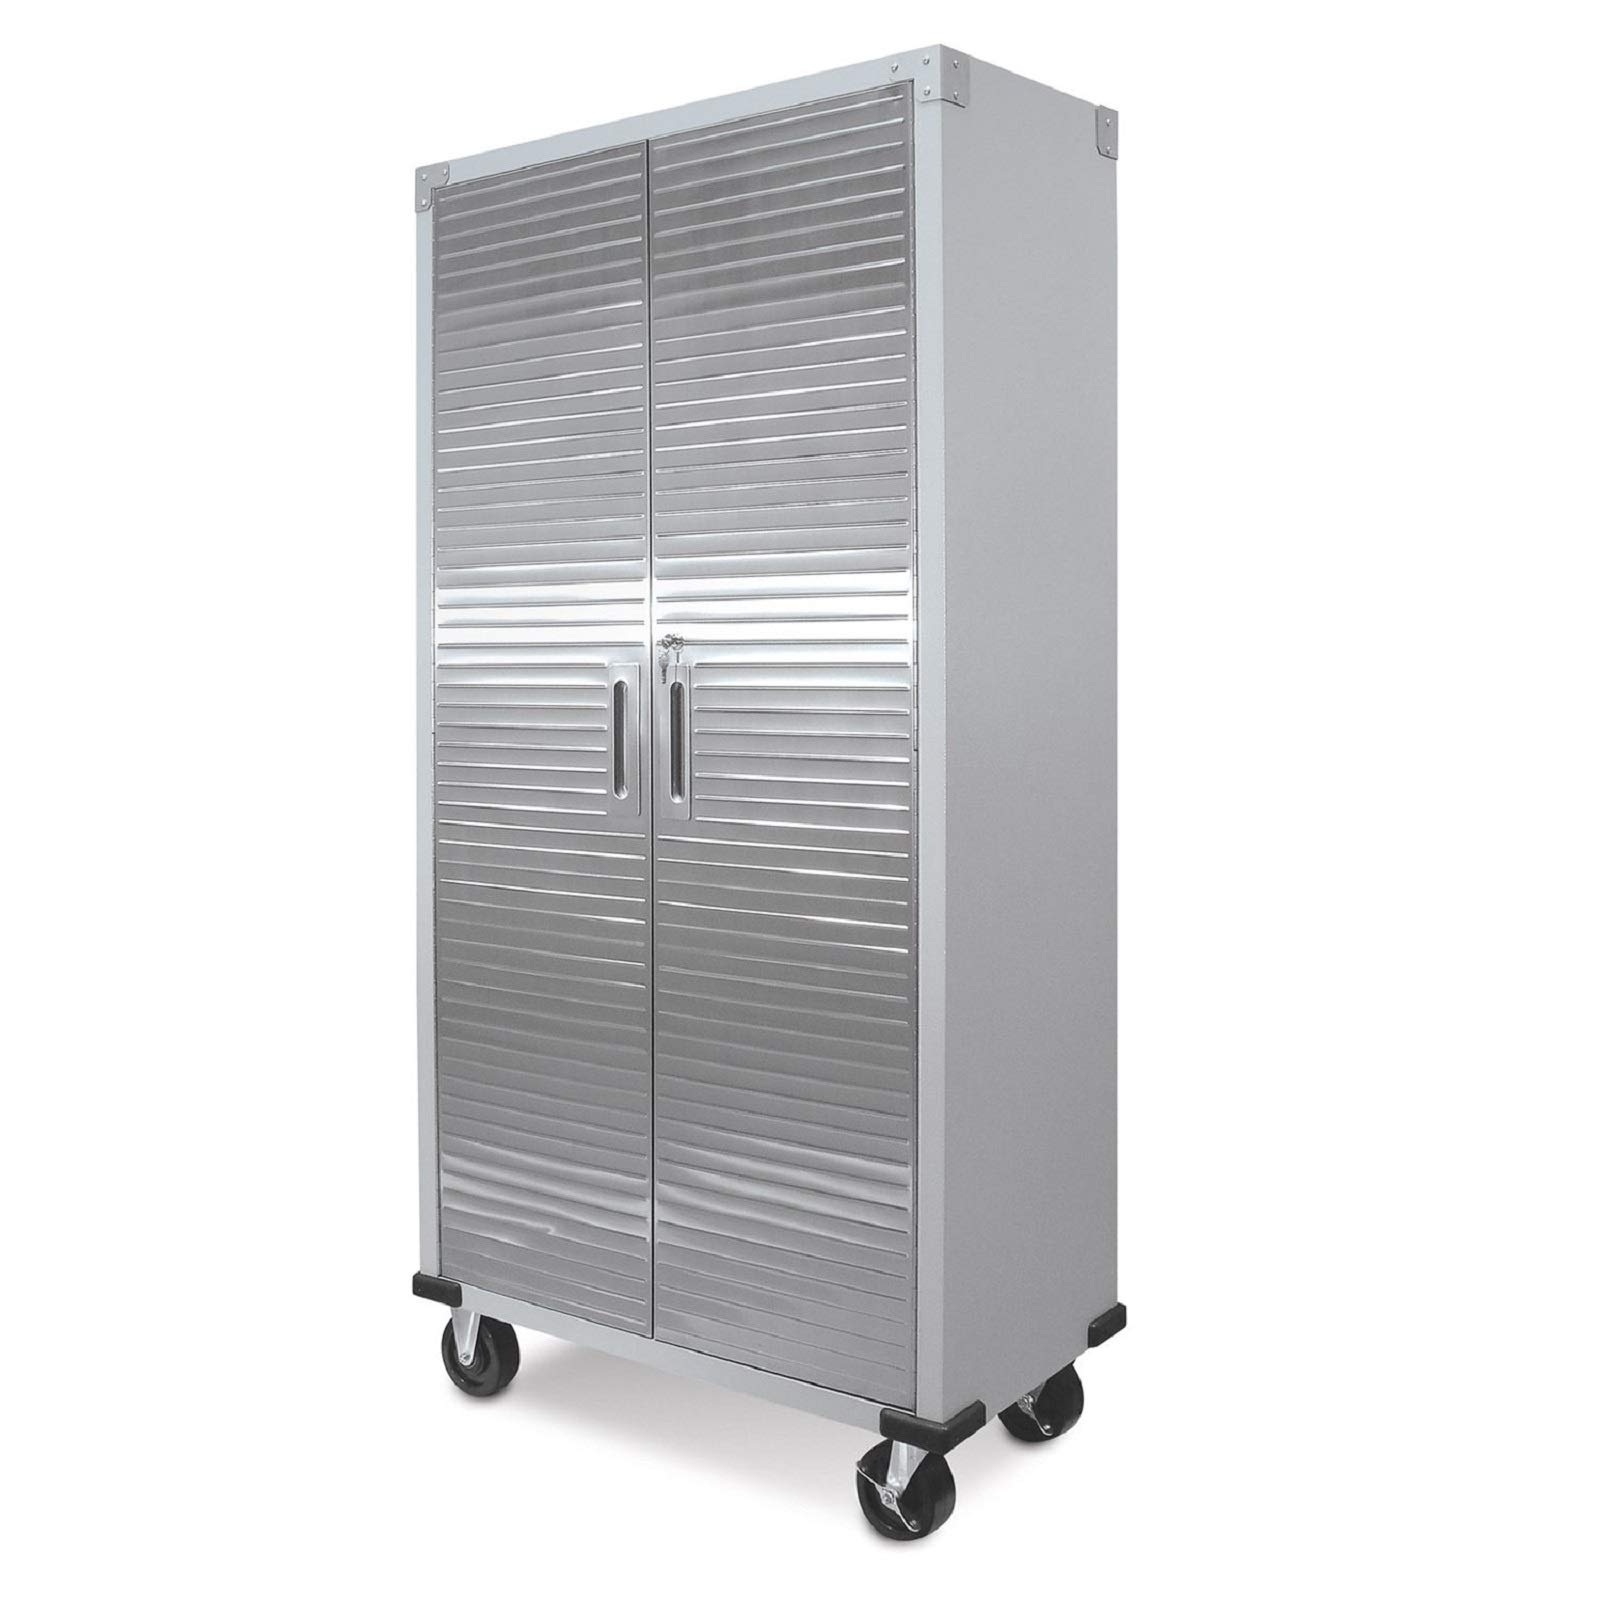 Seville Classics Heavy Duty Storage Cabinet UHD16234 by Seville Classics